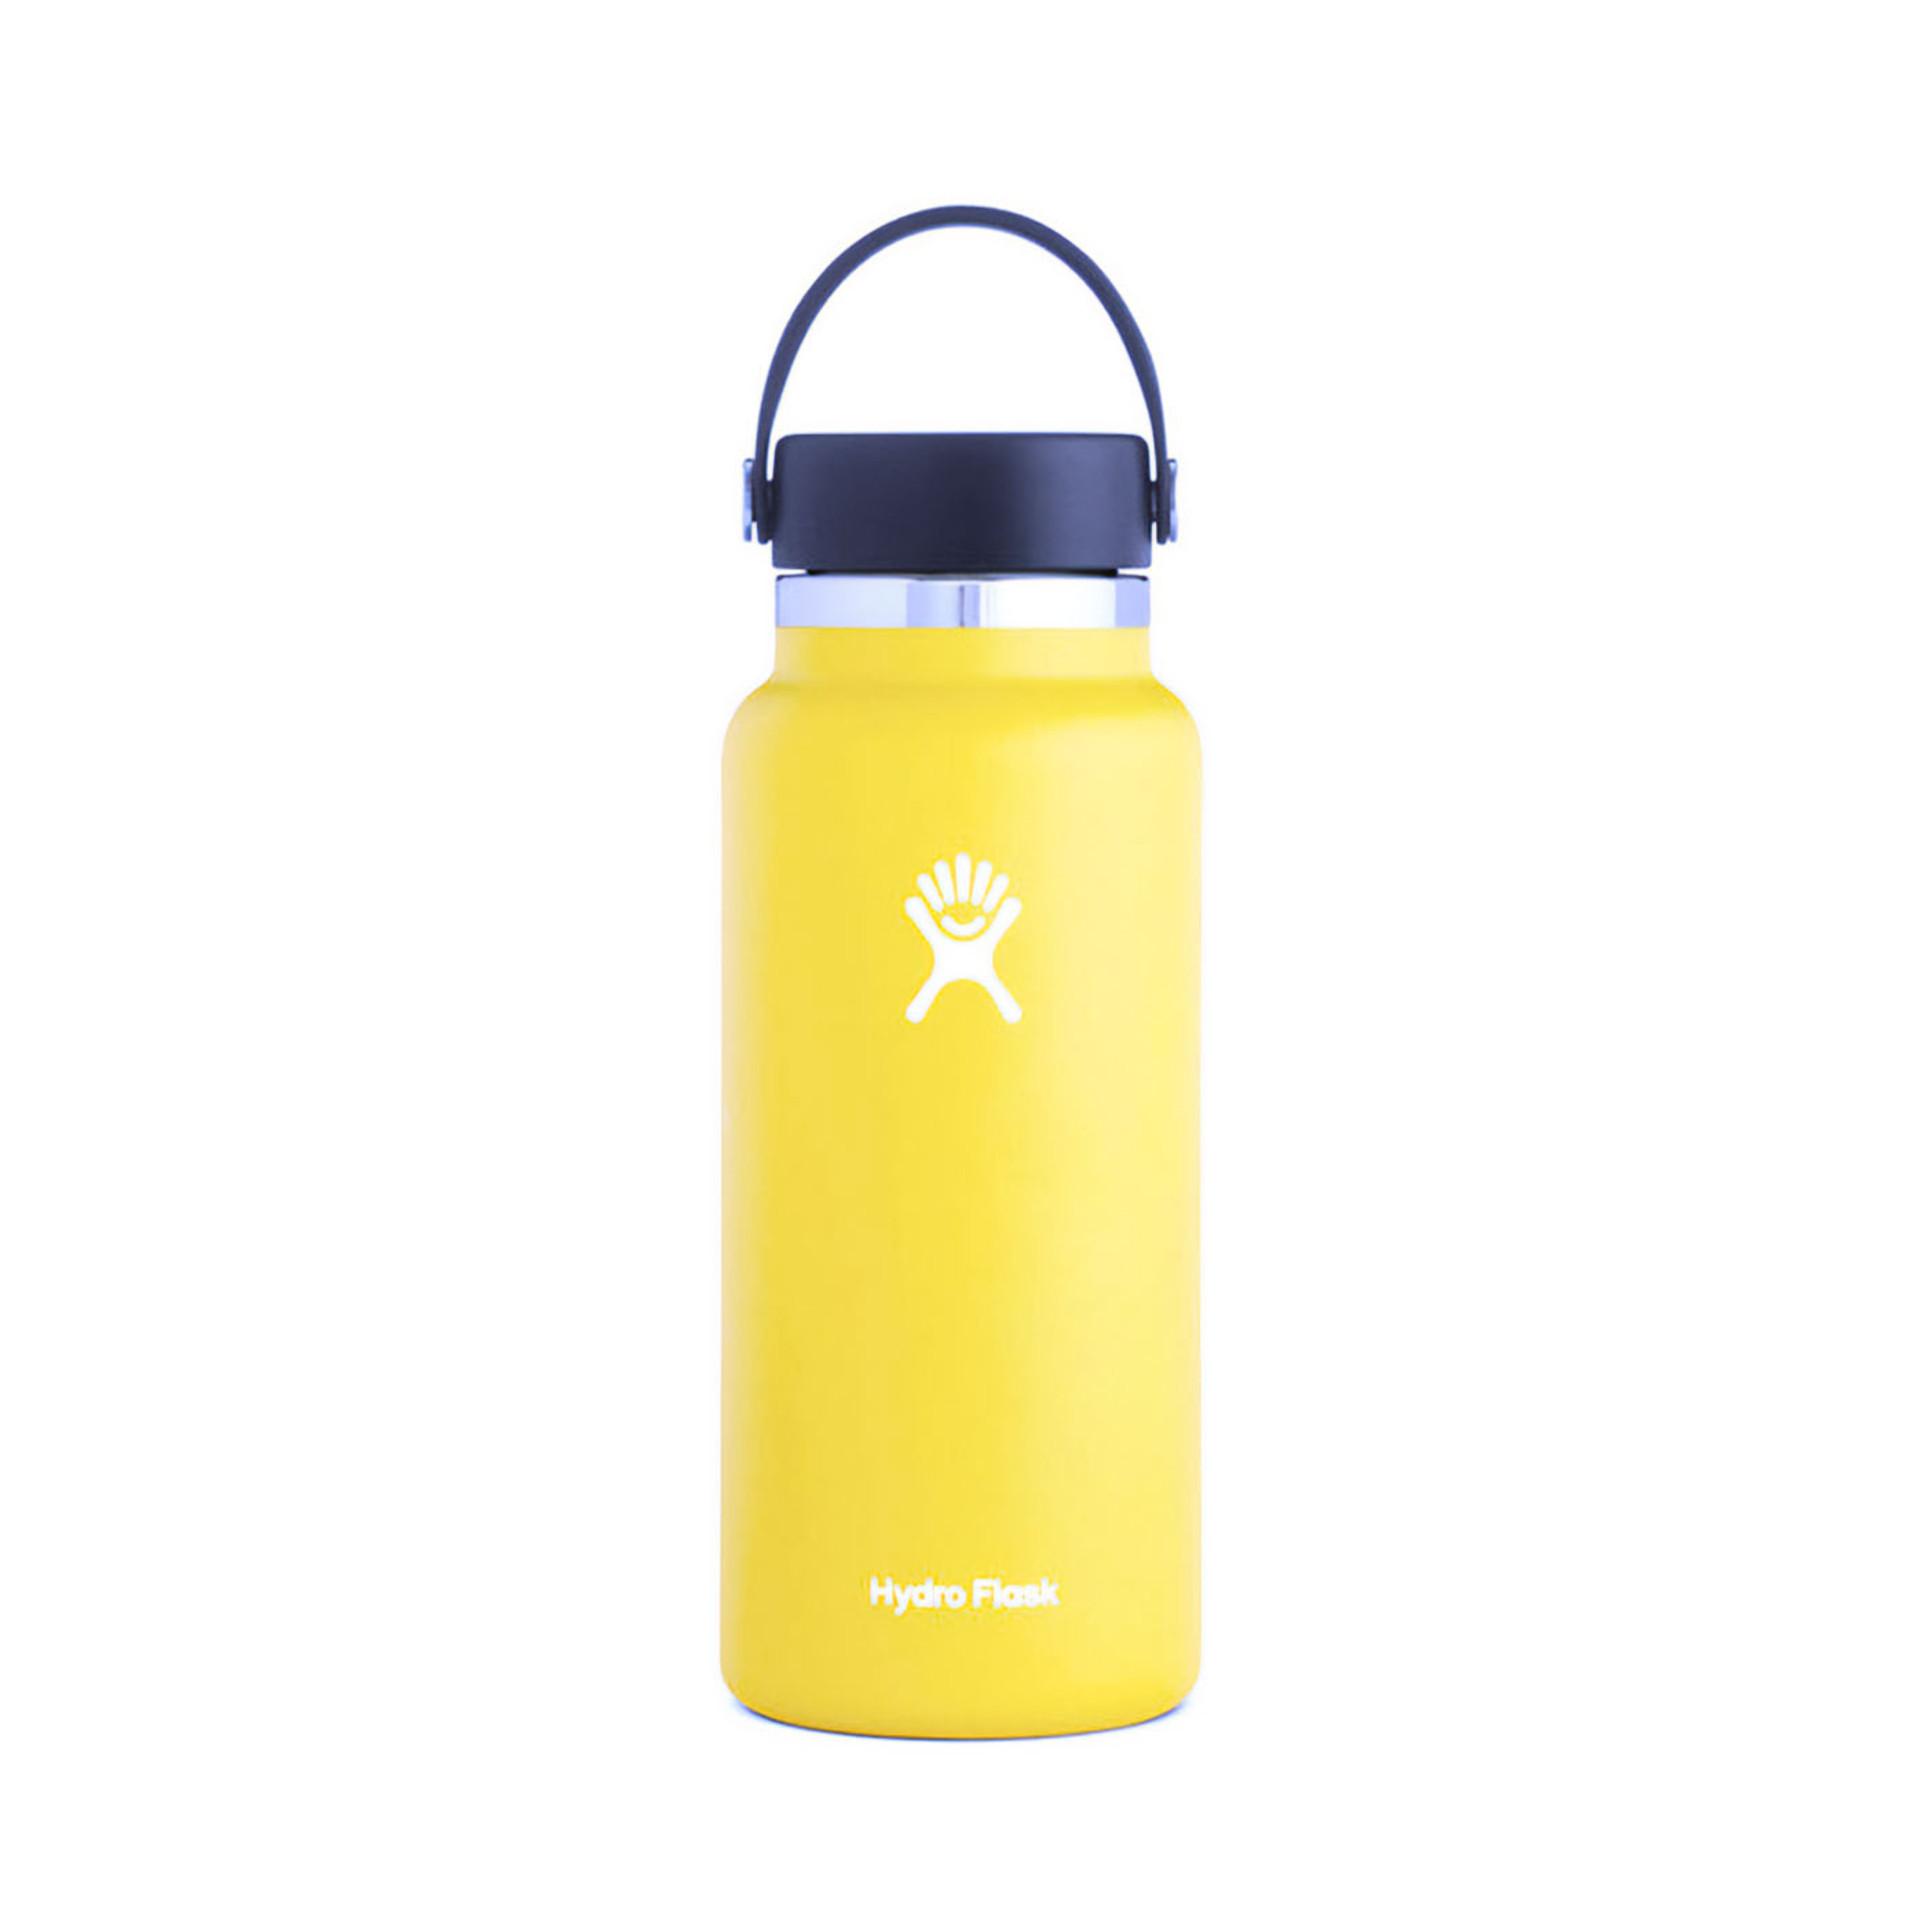 Hydro Flask Wide Mouth Water Bottle 32oz – Sunflower